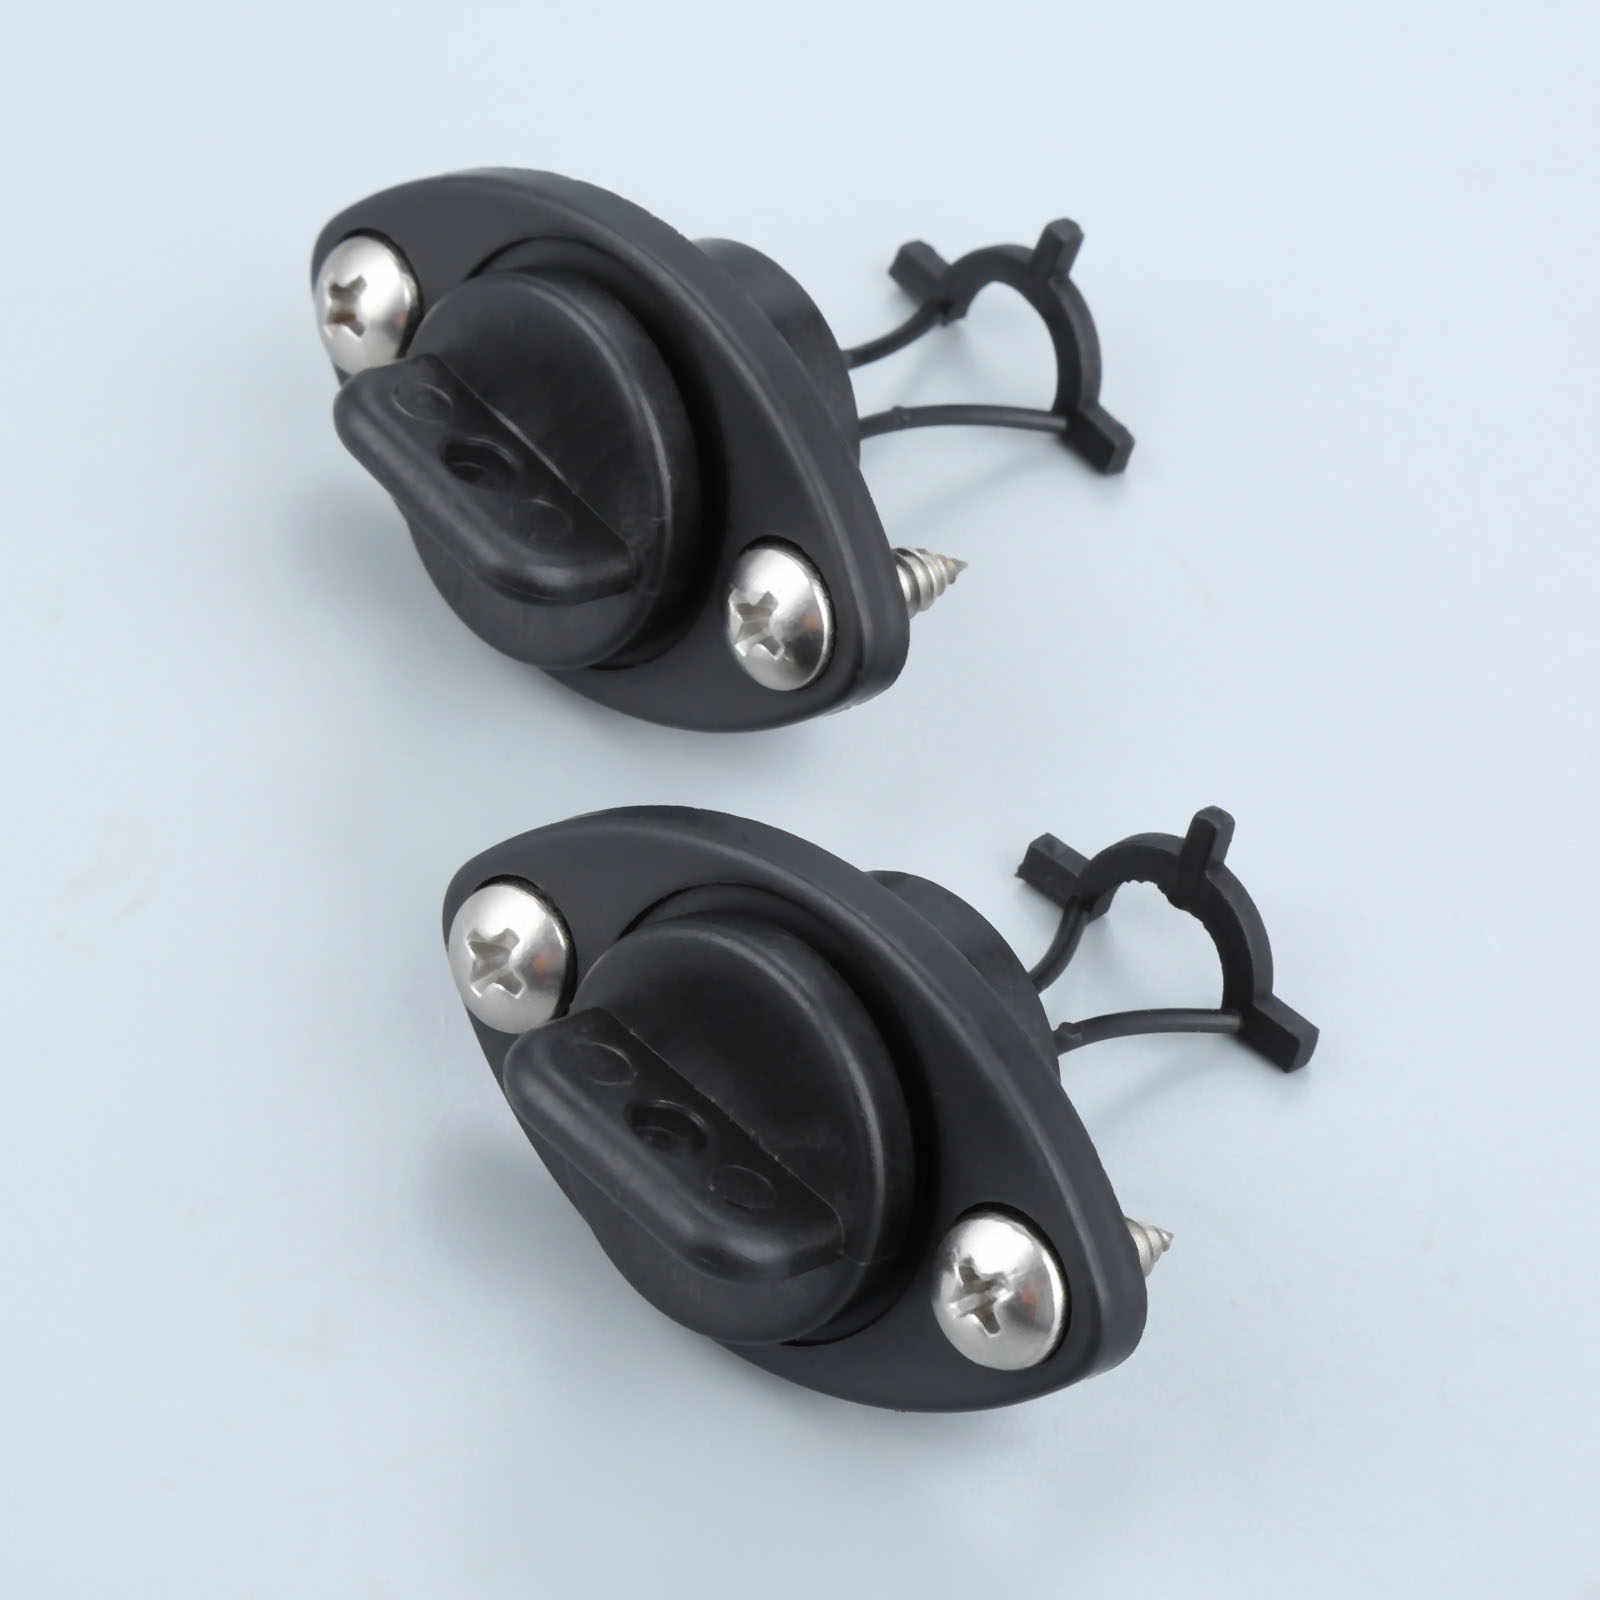 2pcs//set universal drain plug kit plugs bung for dinghy kayak canoes boat Pq